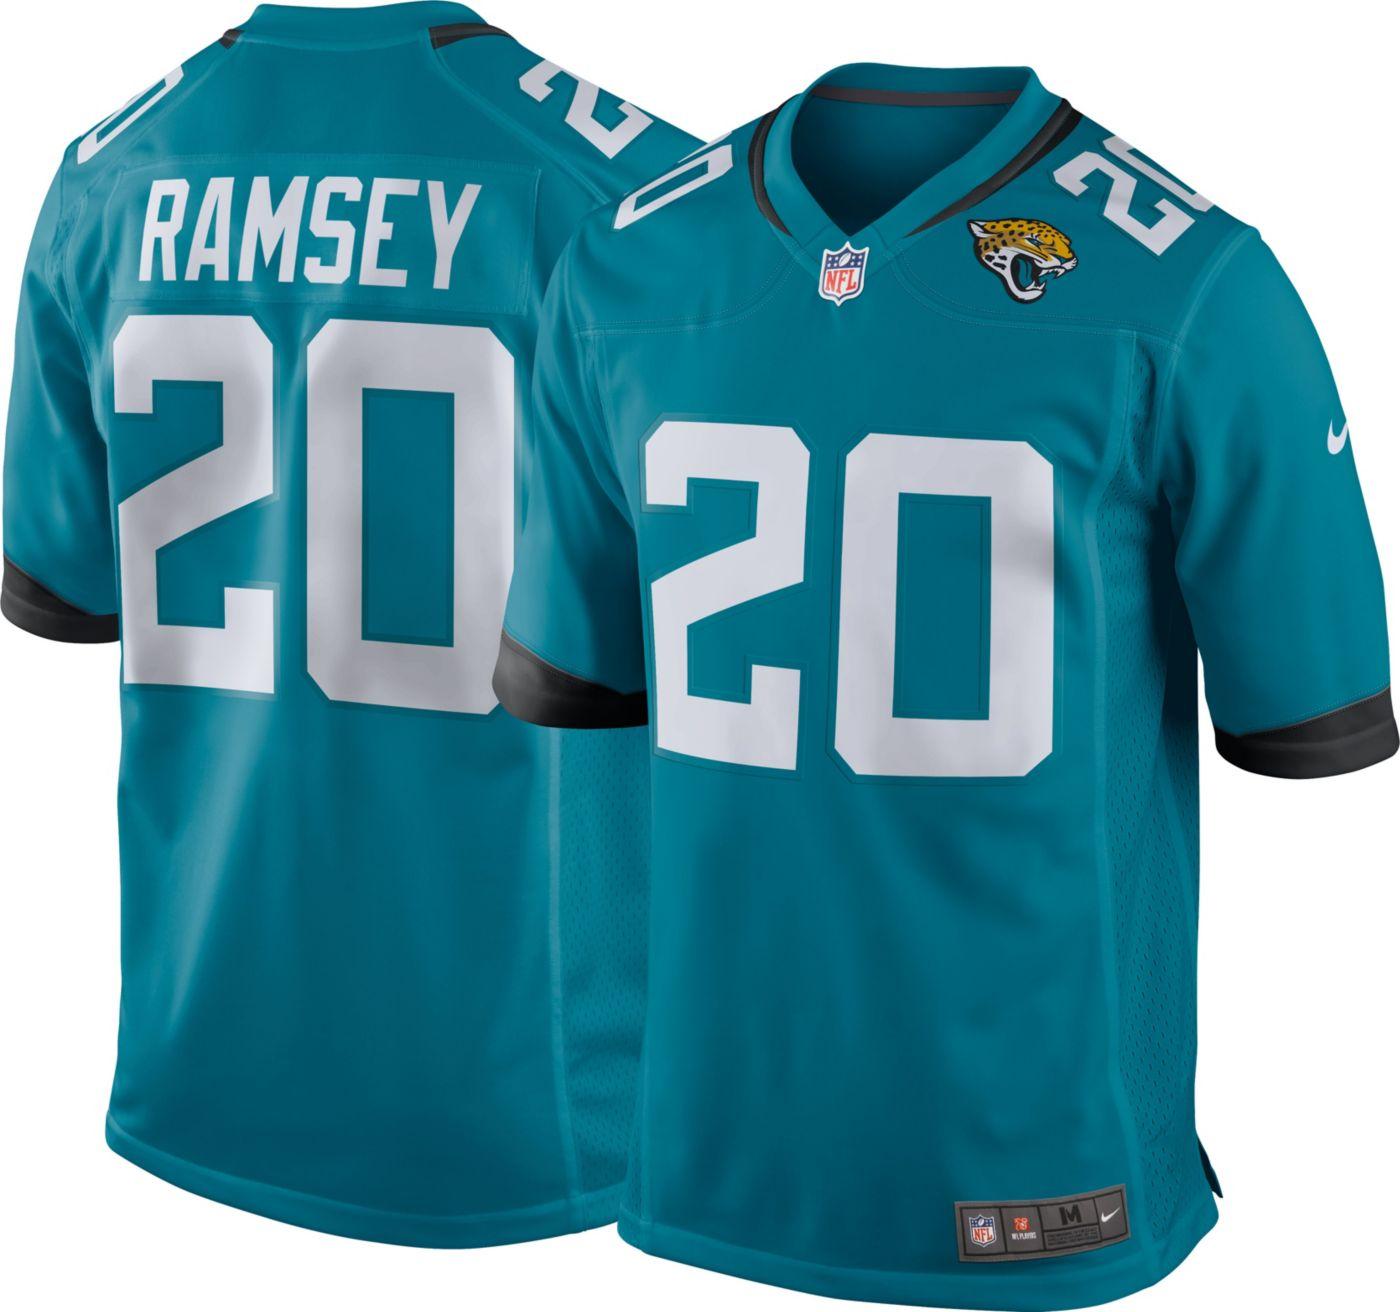 Nike Men's Alternate Game Jersey Jacksonville Jaguars Jalen Ramsey #20